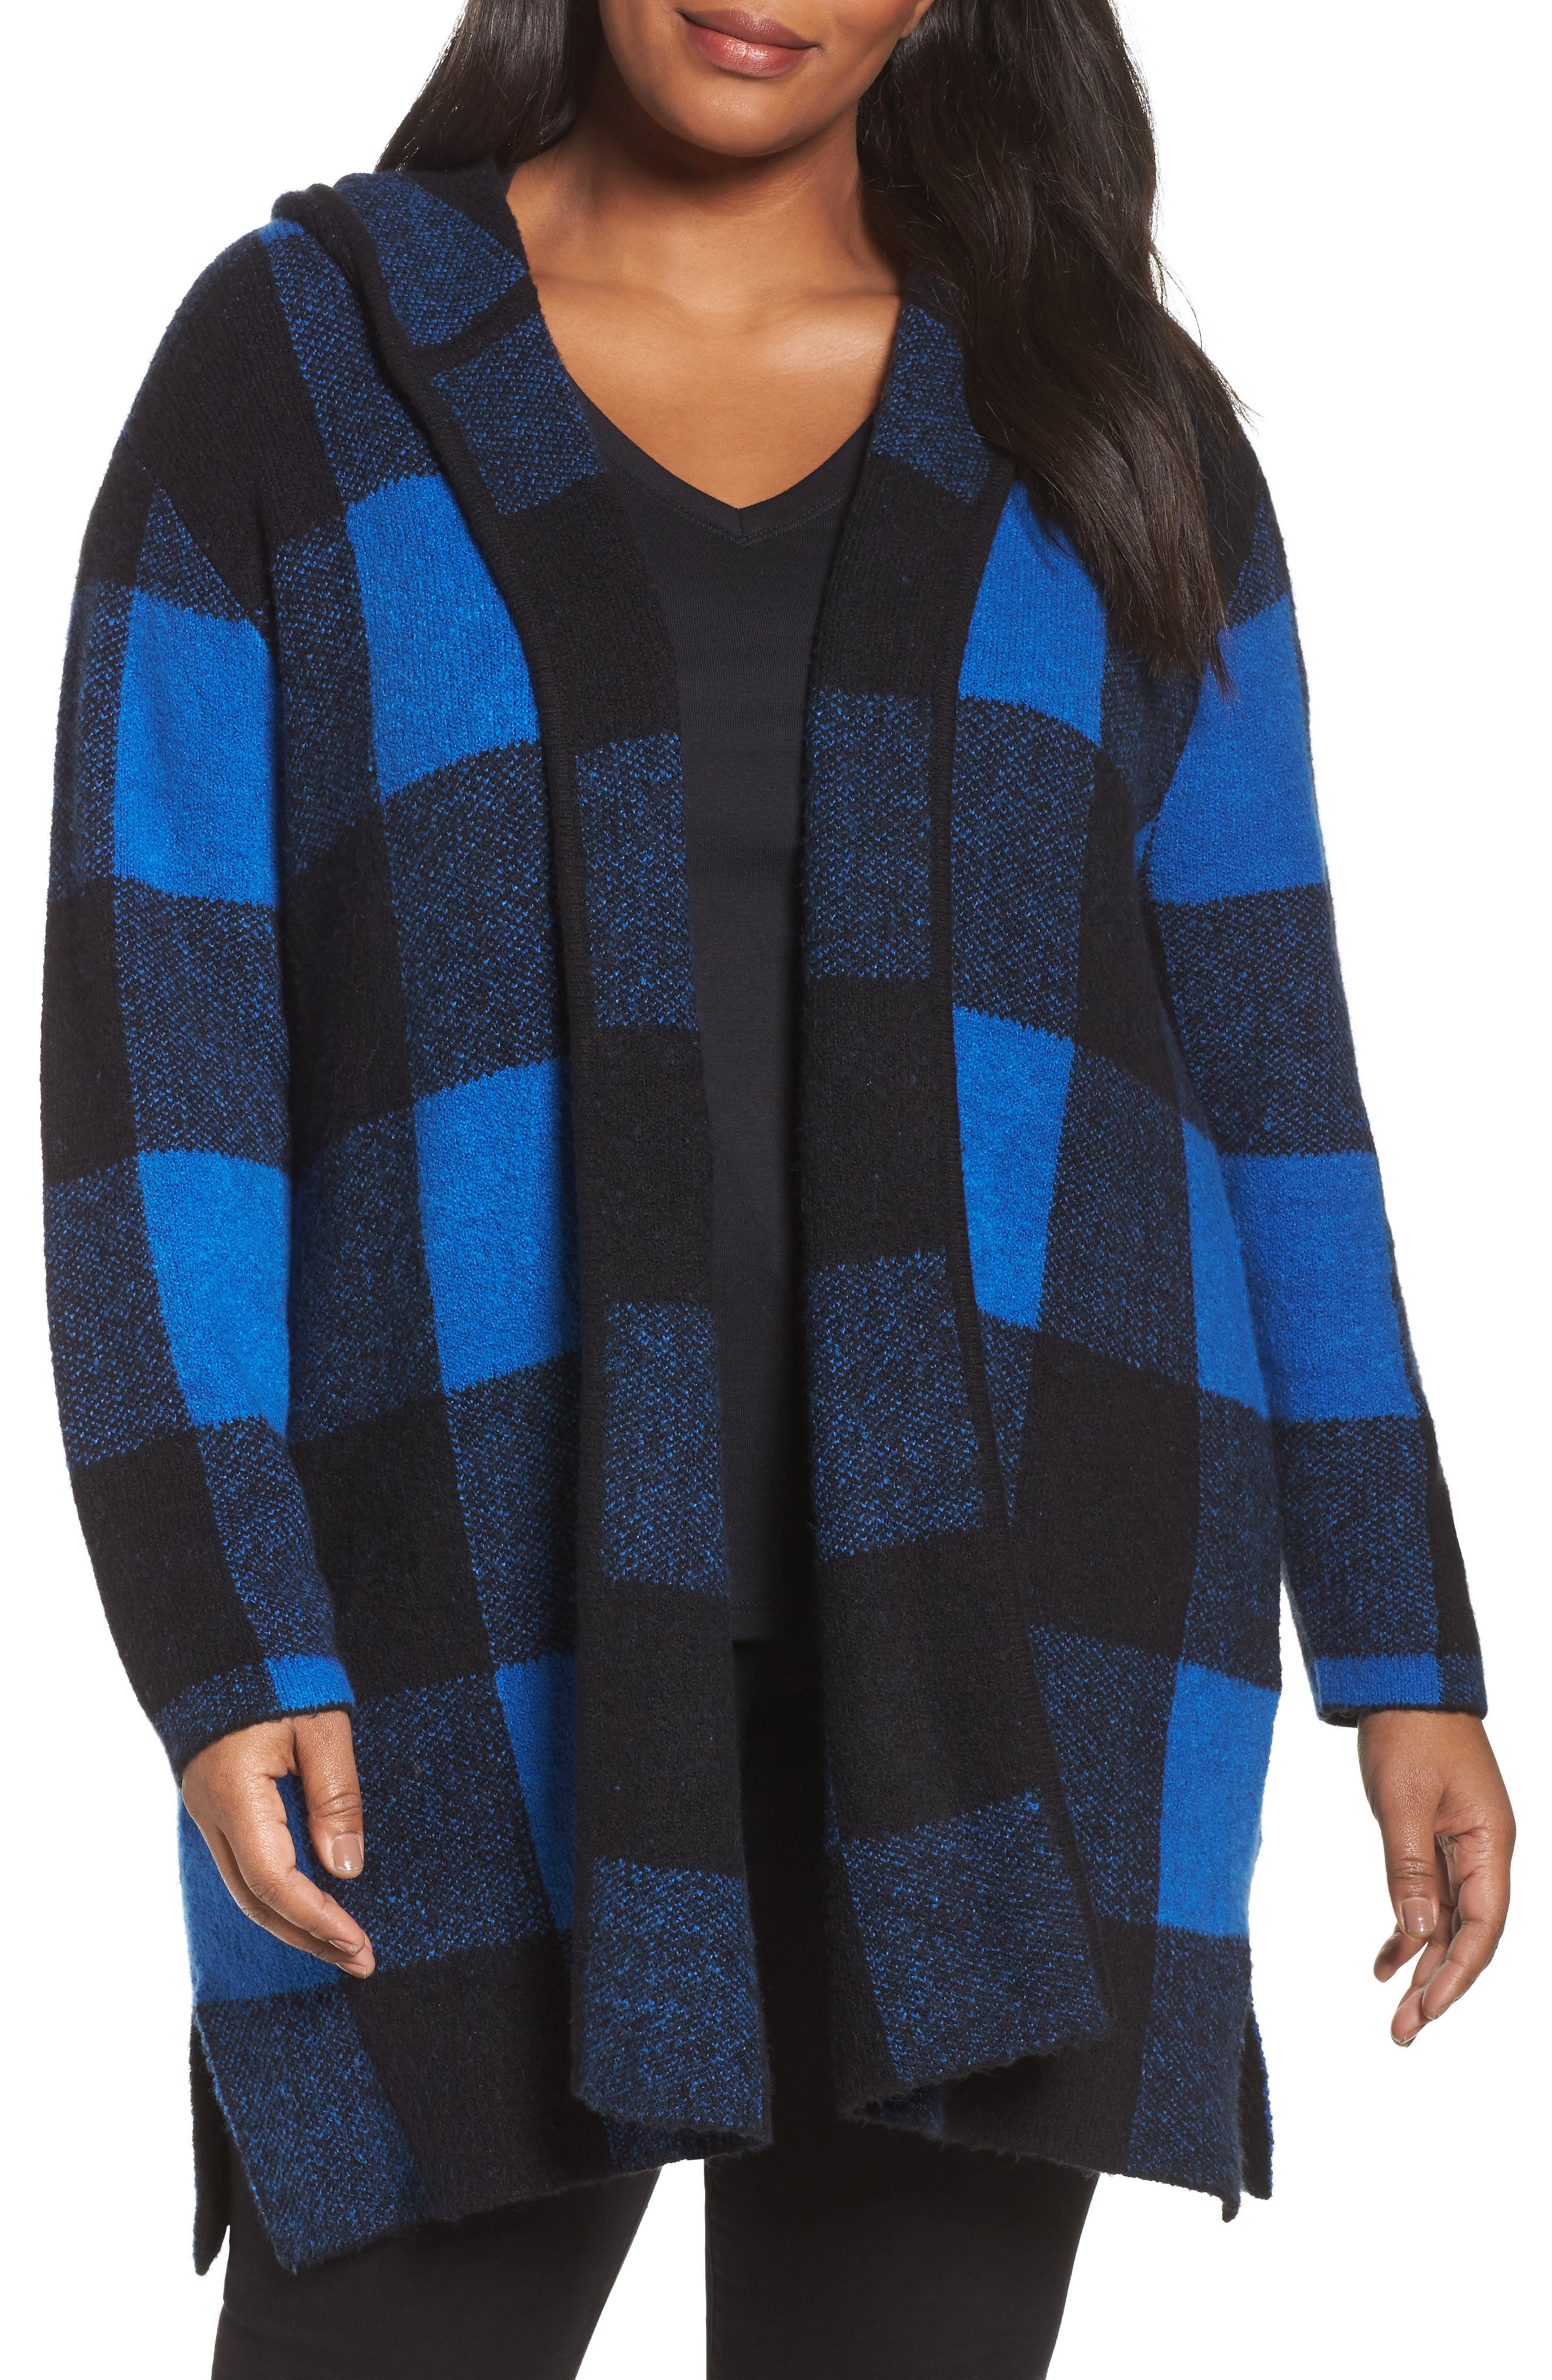 Plaid Hooded Sweater Coatigan,                             Main thumbnail 1, color,                             Blue Checkerboard Jacquard